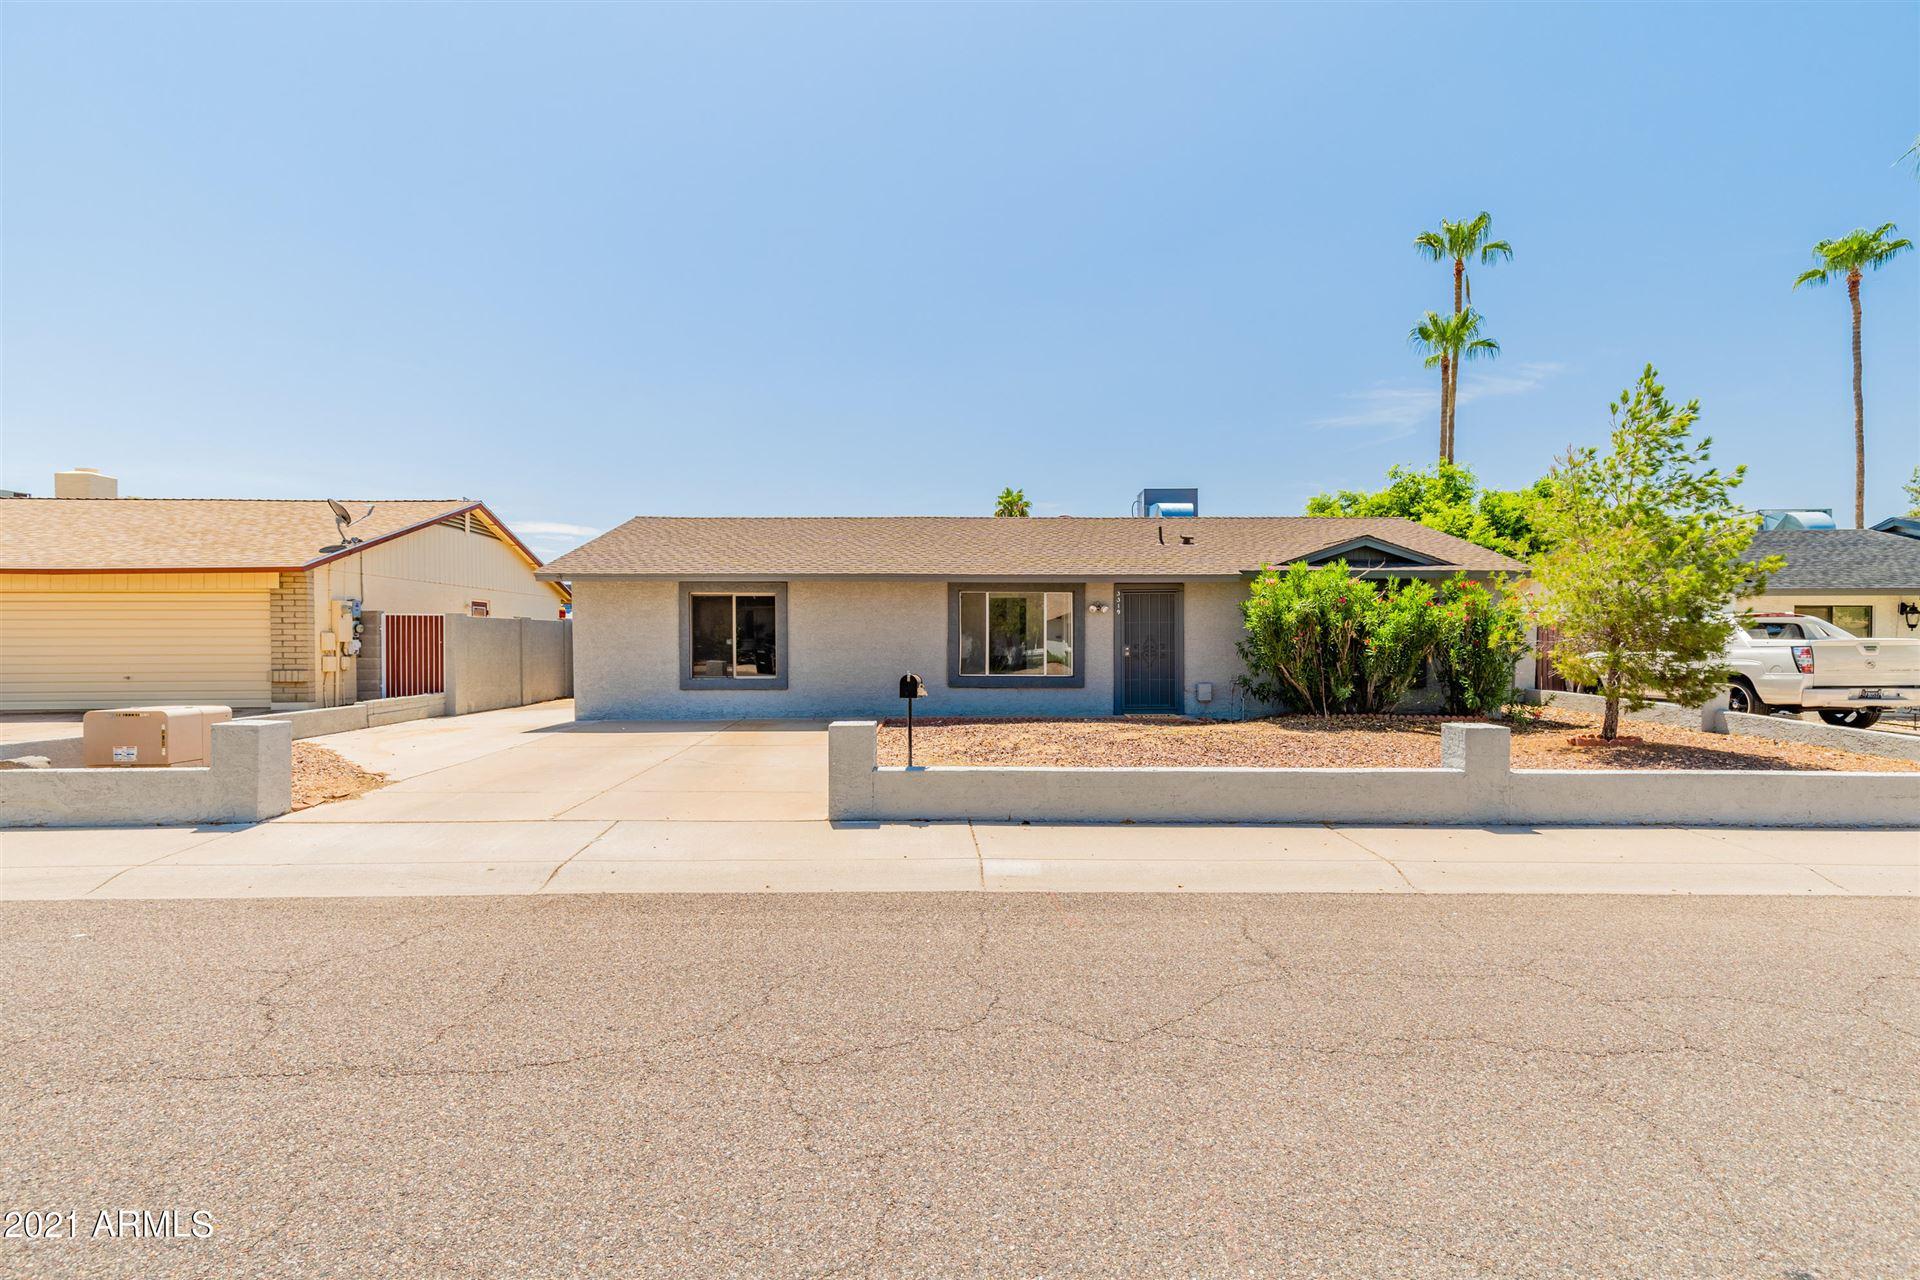 3319 E CAMPO BELLO Drive, Phoenix, AZ 85032 - MLS#: 6271652